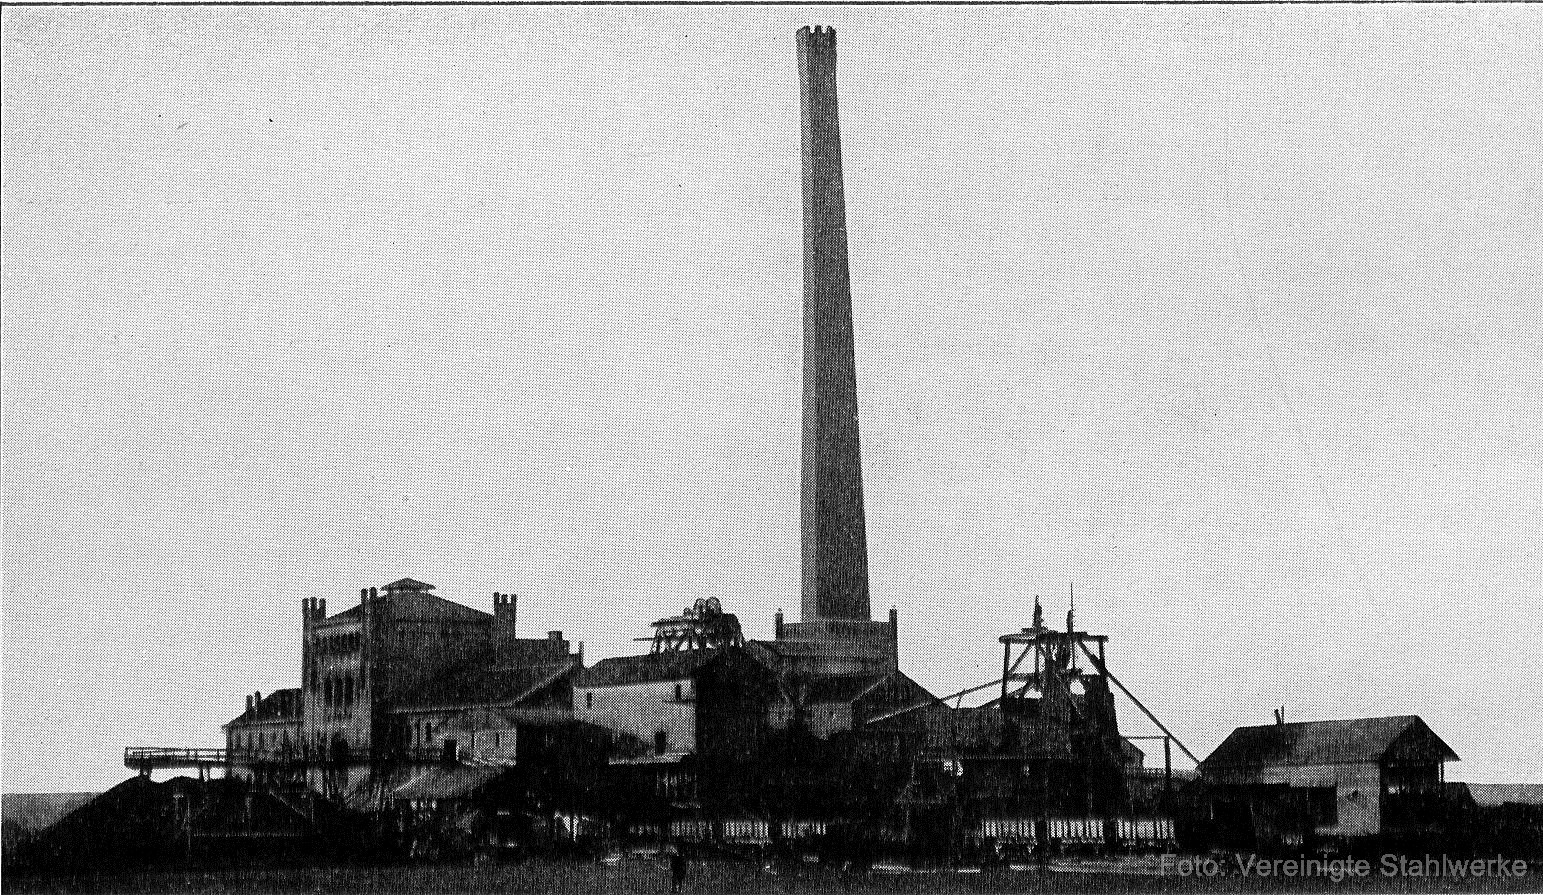 17 hansa 1871